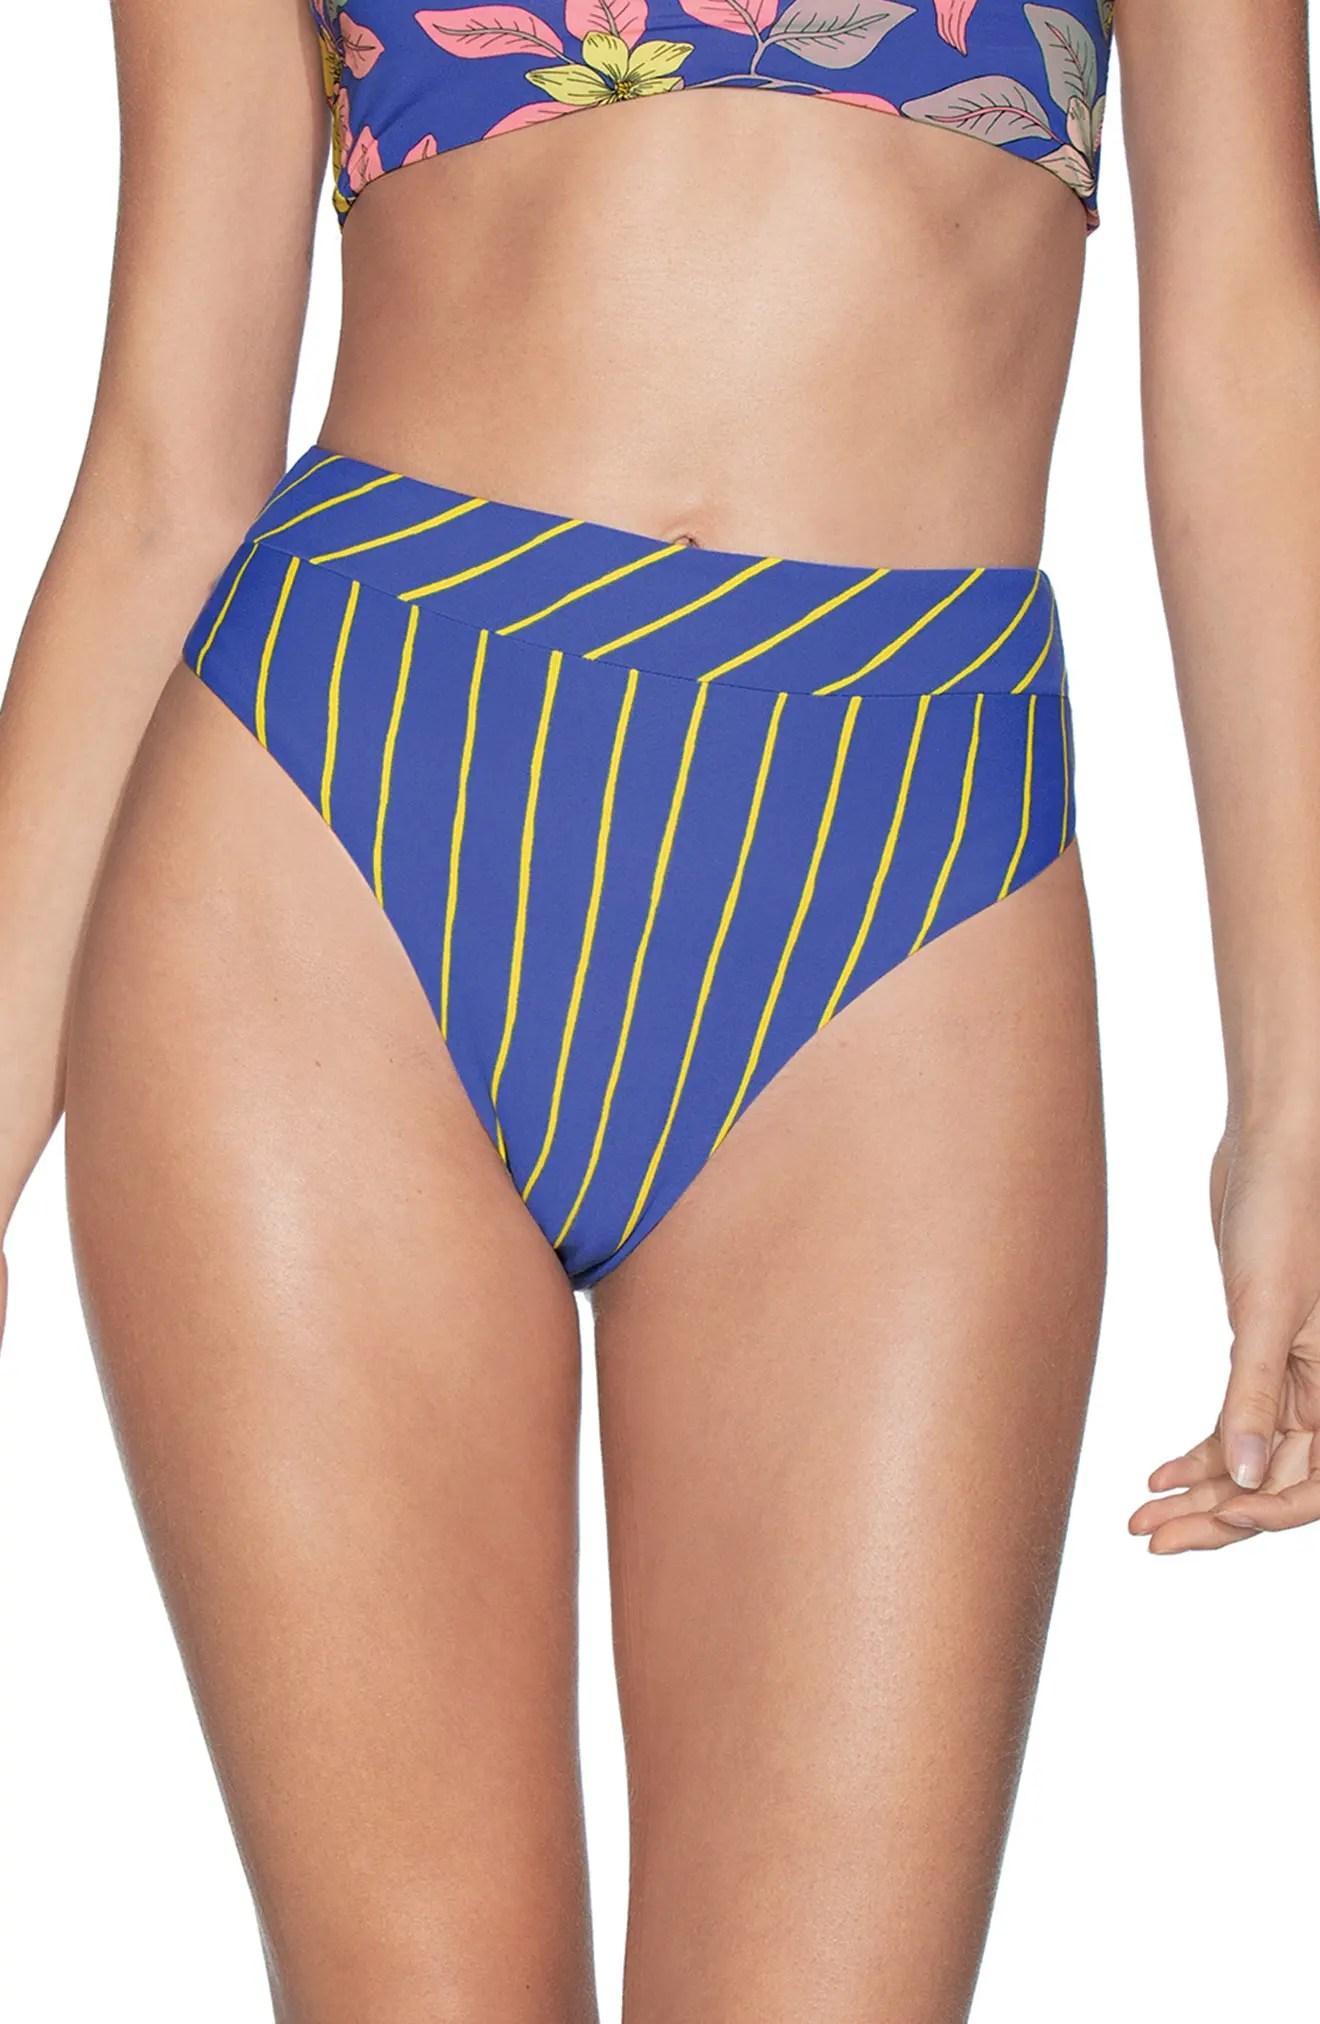 maaji lorelei suzy q high waist reversible bikini bottoms nordstrom rack